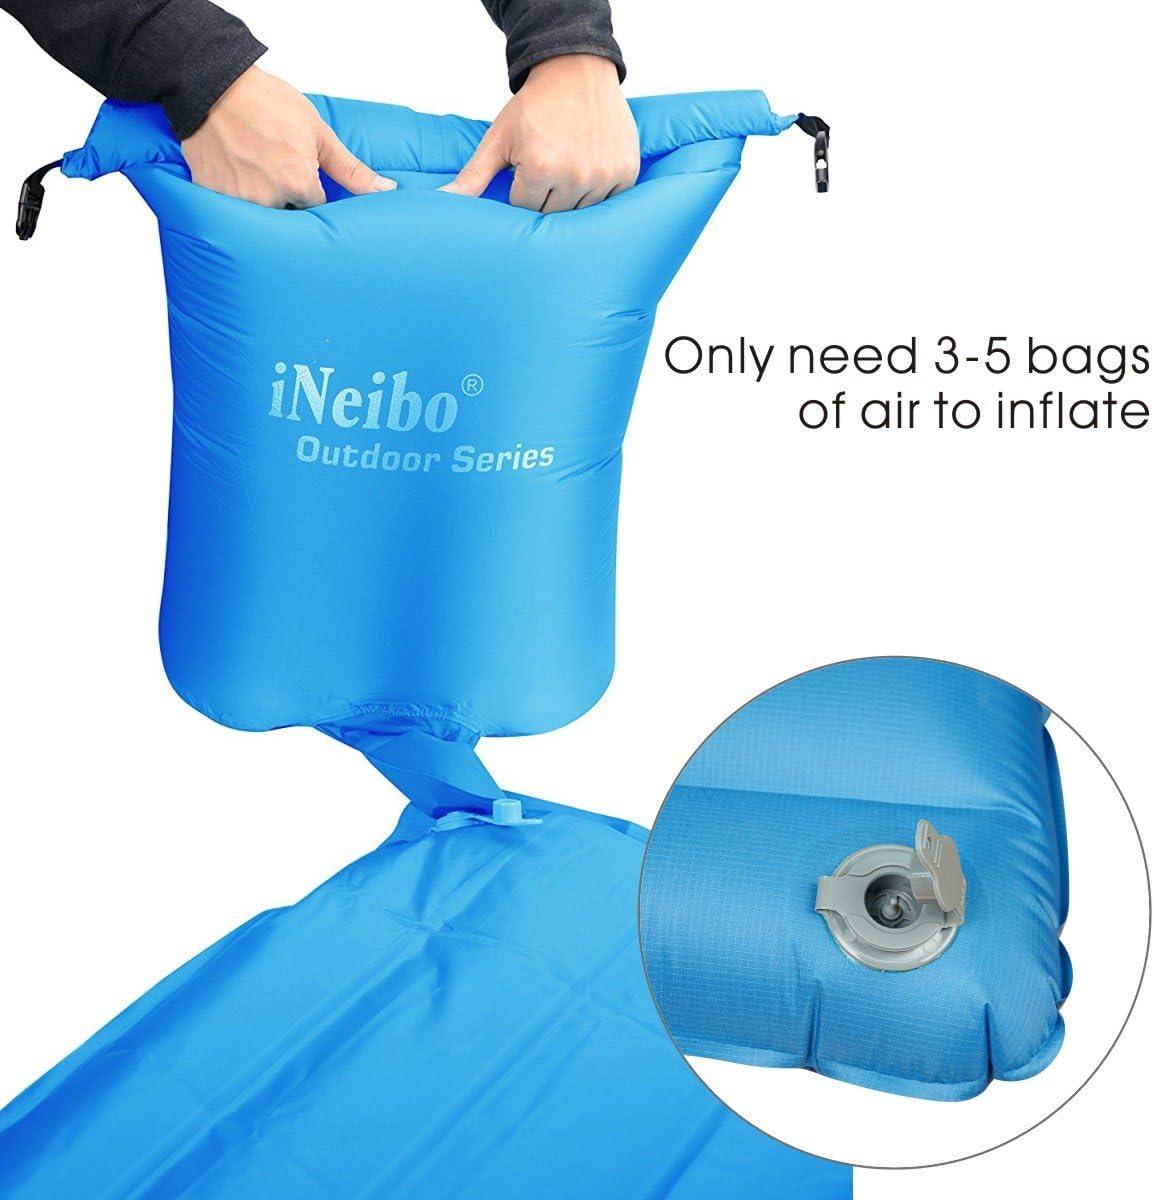 hecho de material de TPU con coj/ín integrado Esterilla para dormir al aire libre Tama/ño: 186x60x8,5cm Azul iNeibo Colch/ón de aire de camping ultraligero